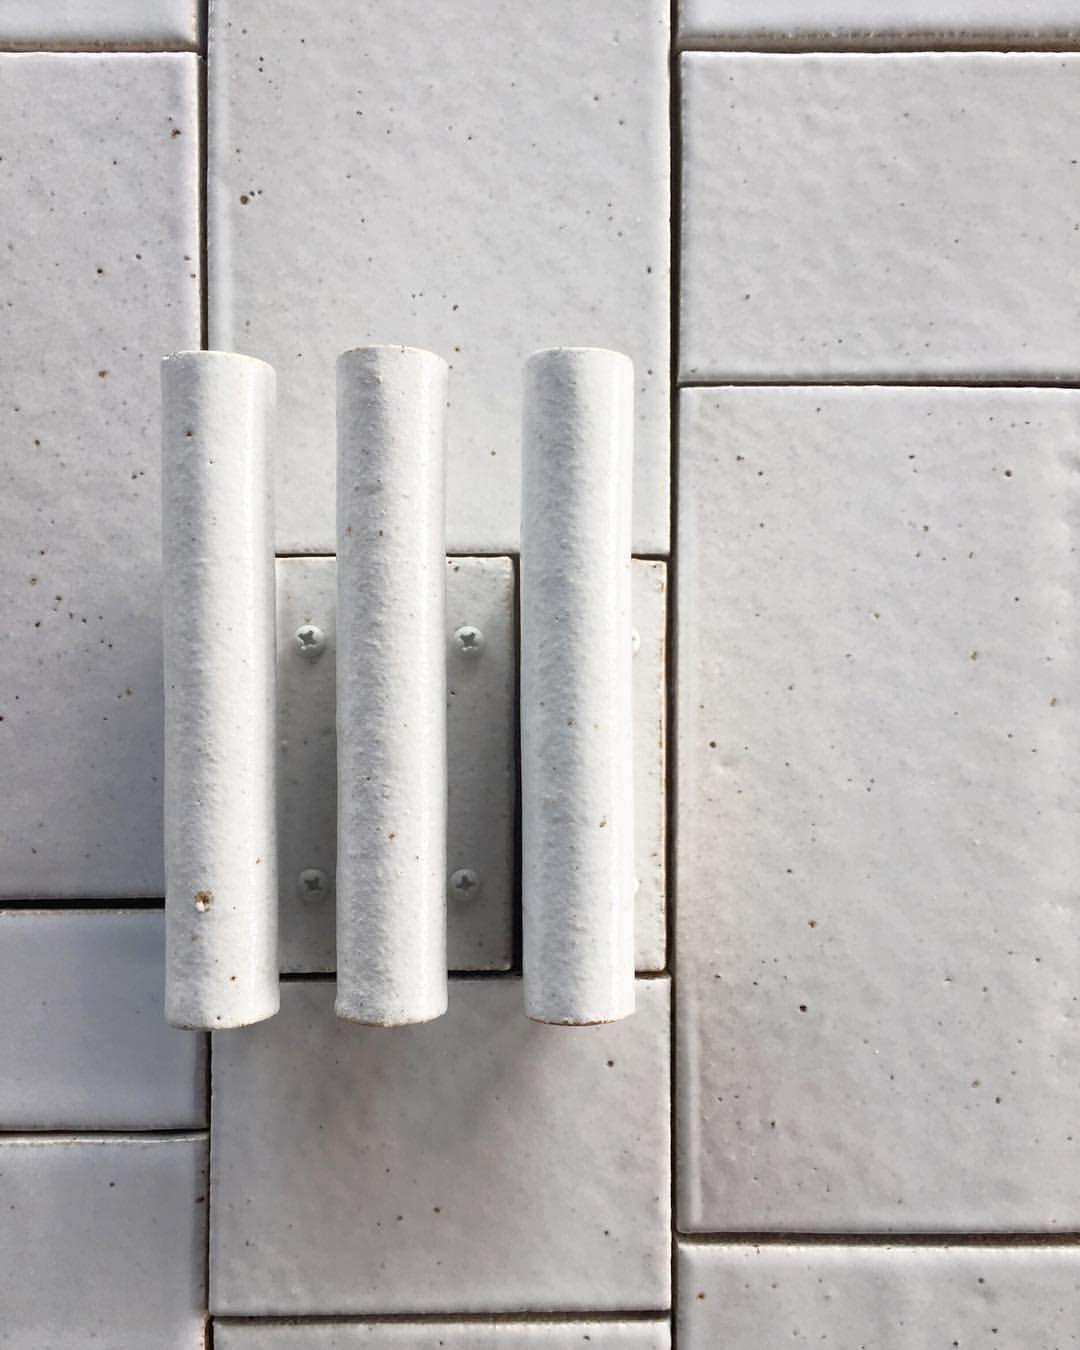 Anchor Ceramics Anchorceramics On Instagram 12420 Wall Hook Meets 100 Series Tile In Spe Ceramic Tile Bathrooms Handmade Tiles Ceramic Tile Floor Bathroom